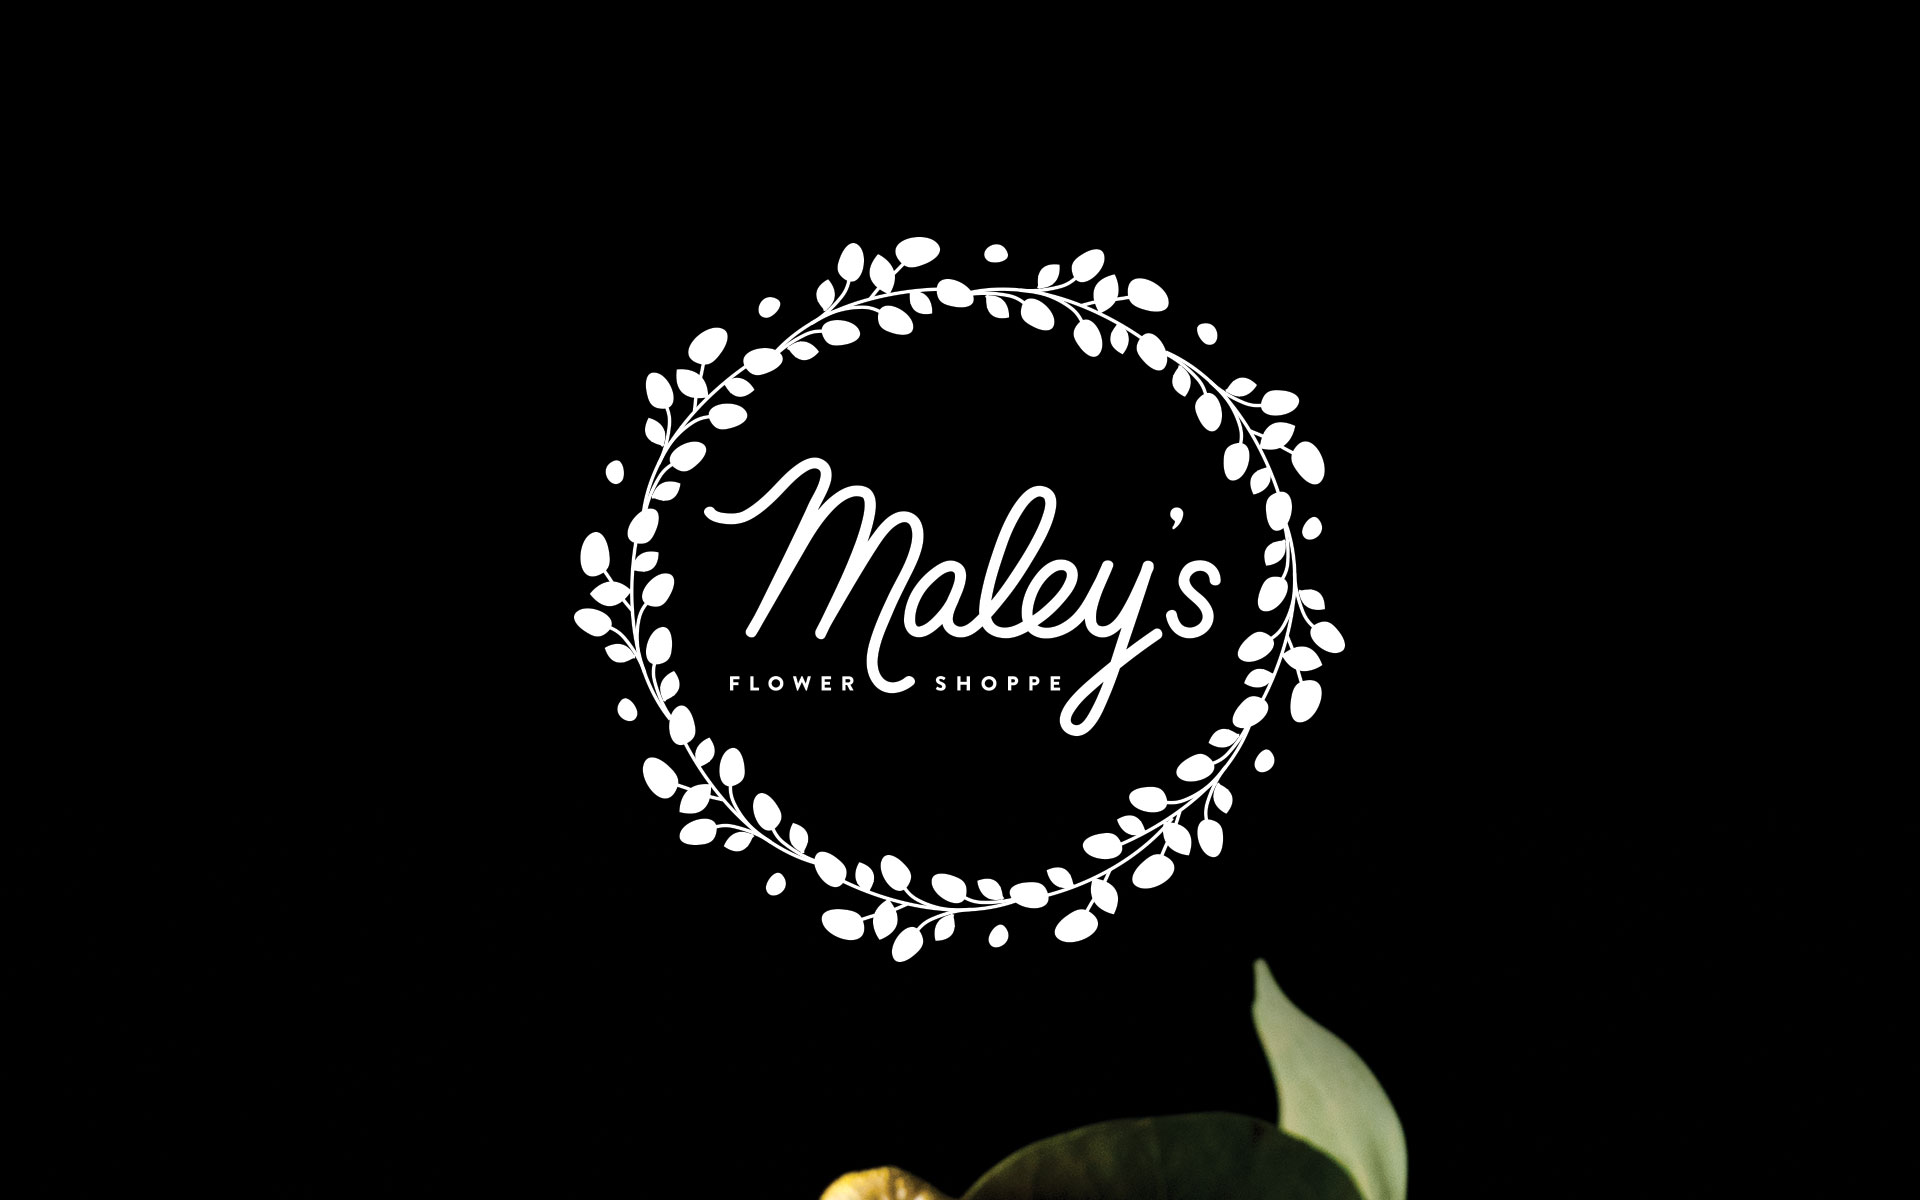 Maley's Flower Shoppe brand identity